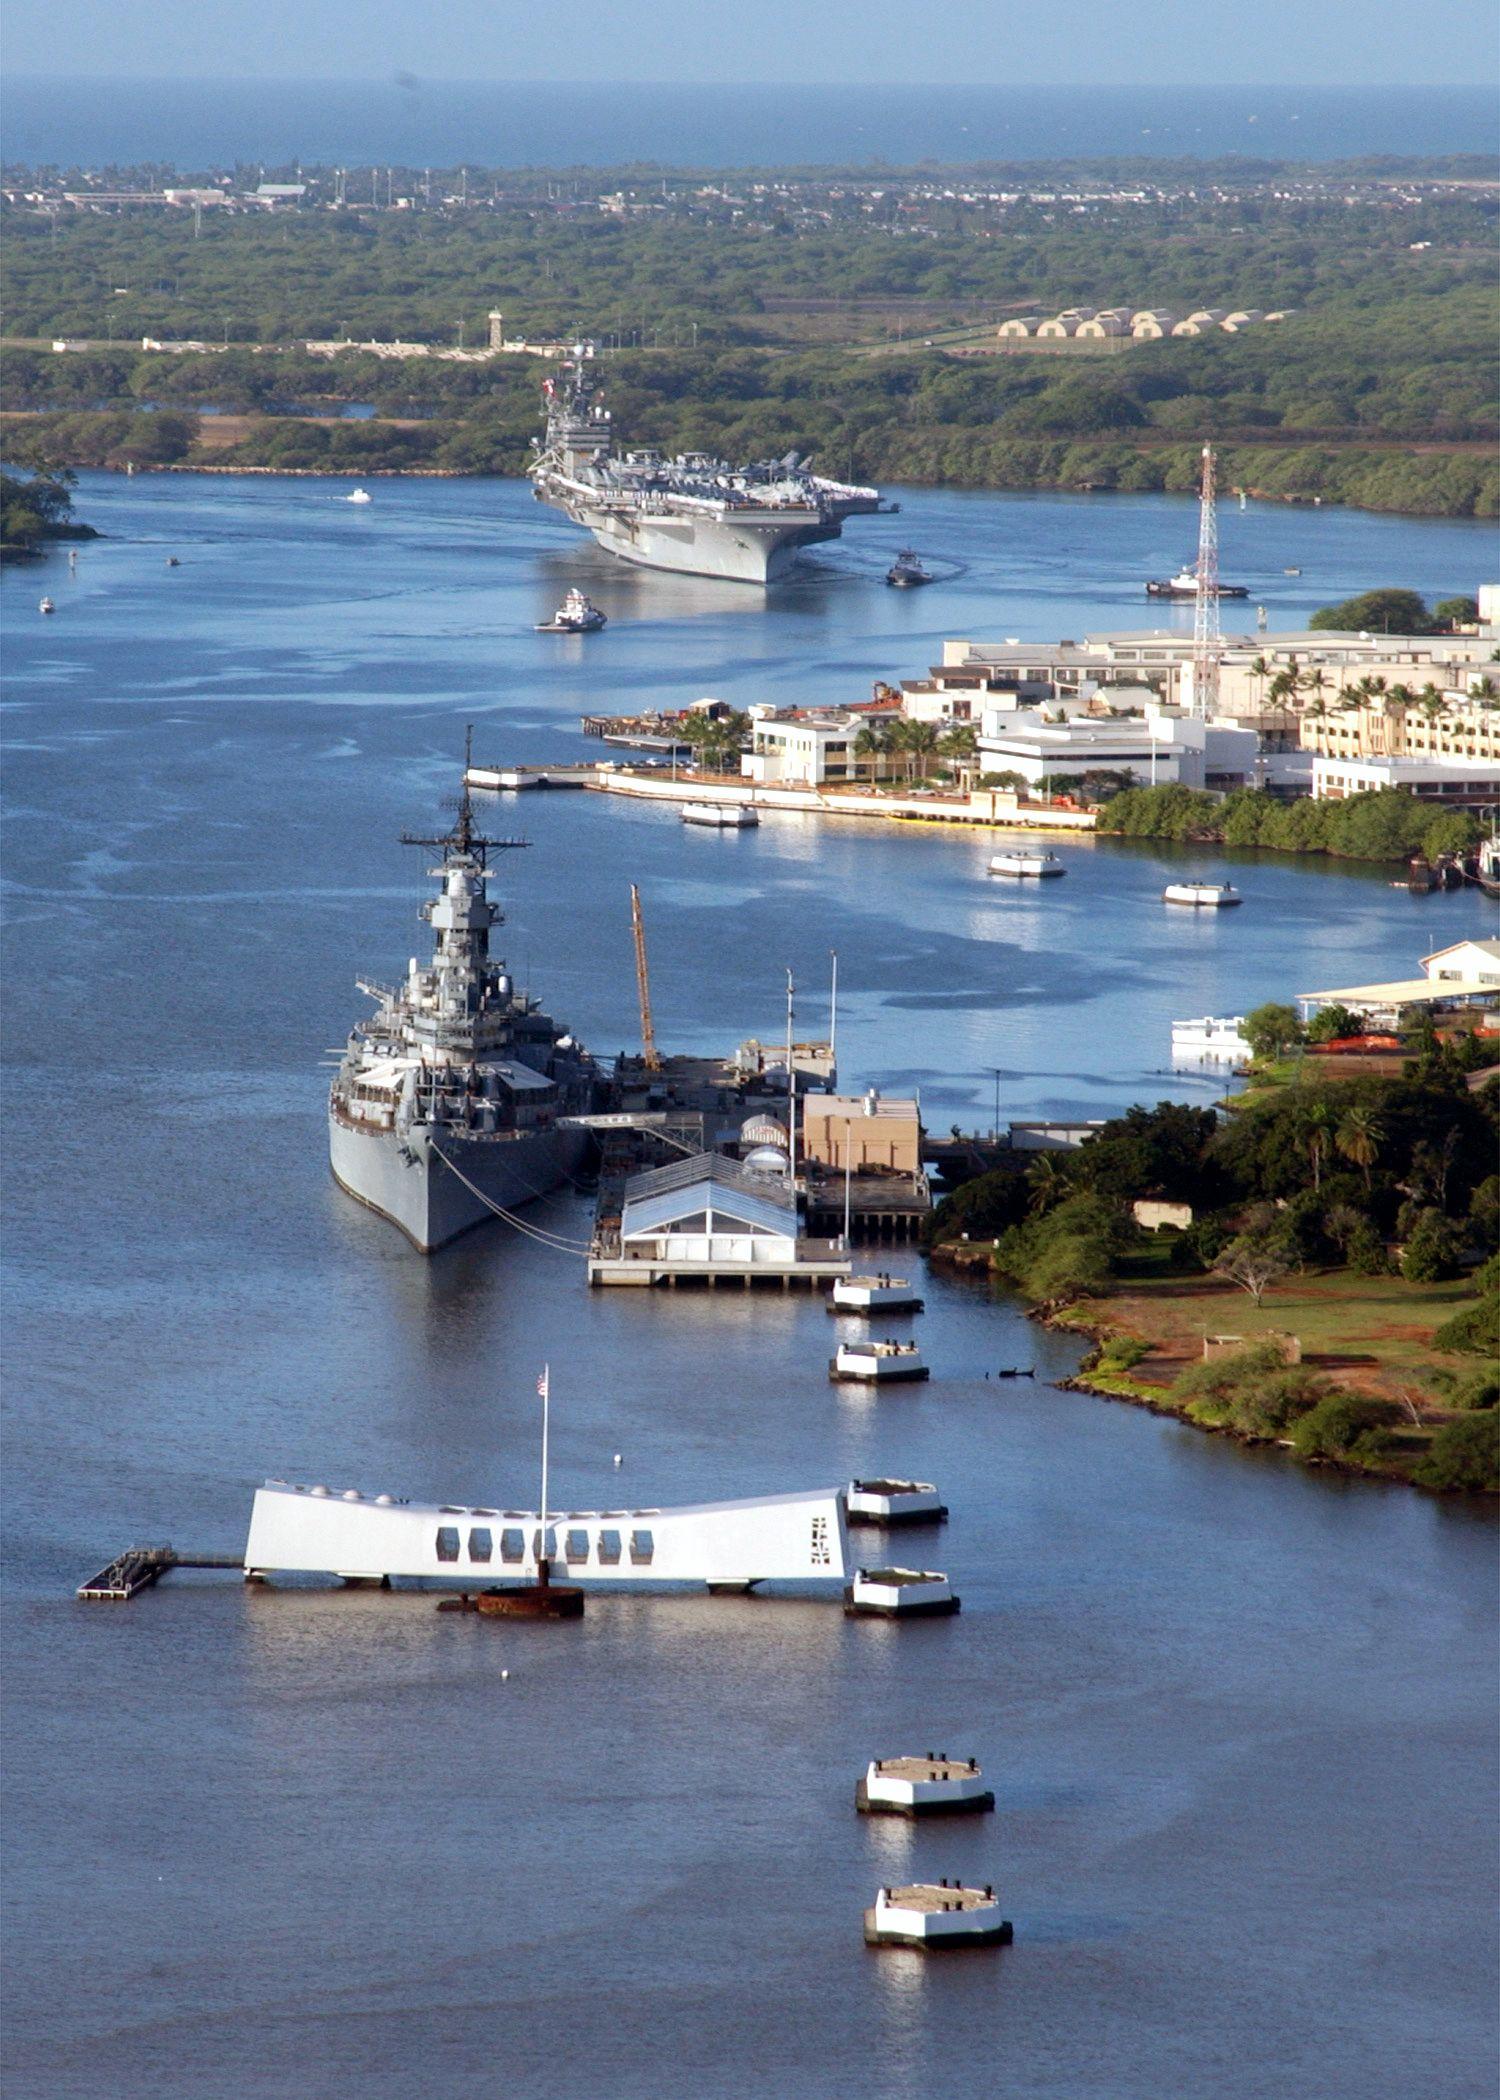 USS Carl Vinson approaches the Arizona Memorial & the